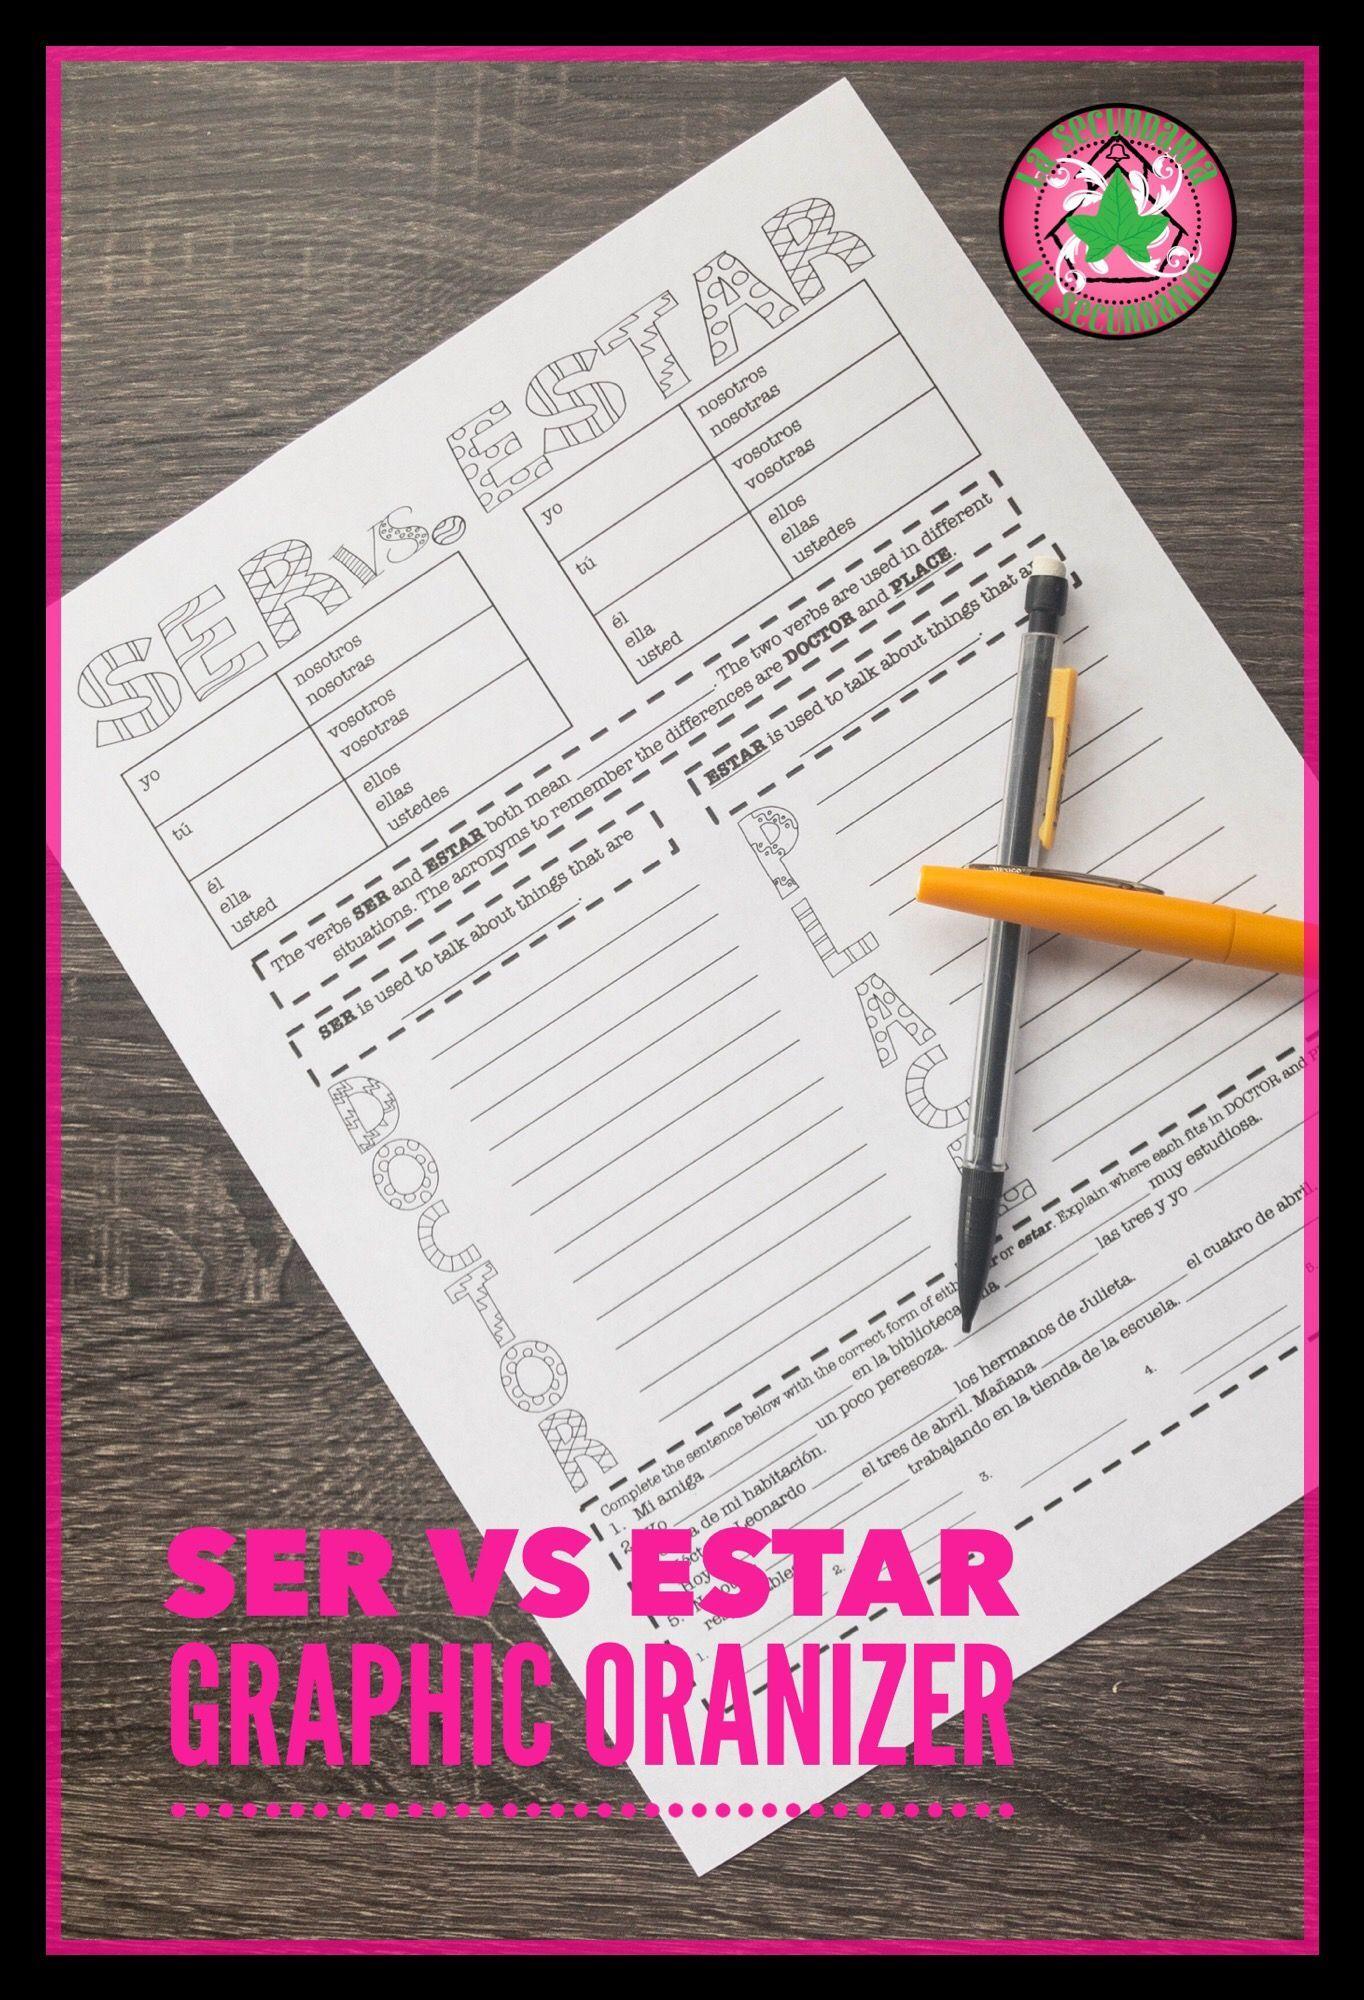 Help Student Better Understand Ser Vs Estar Using This